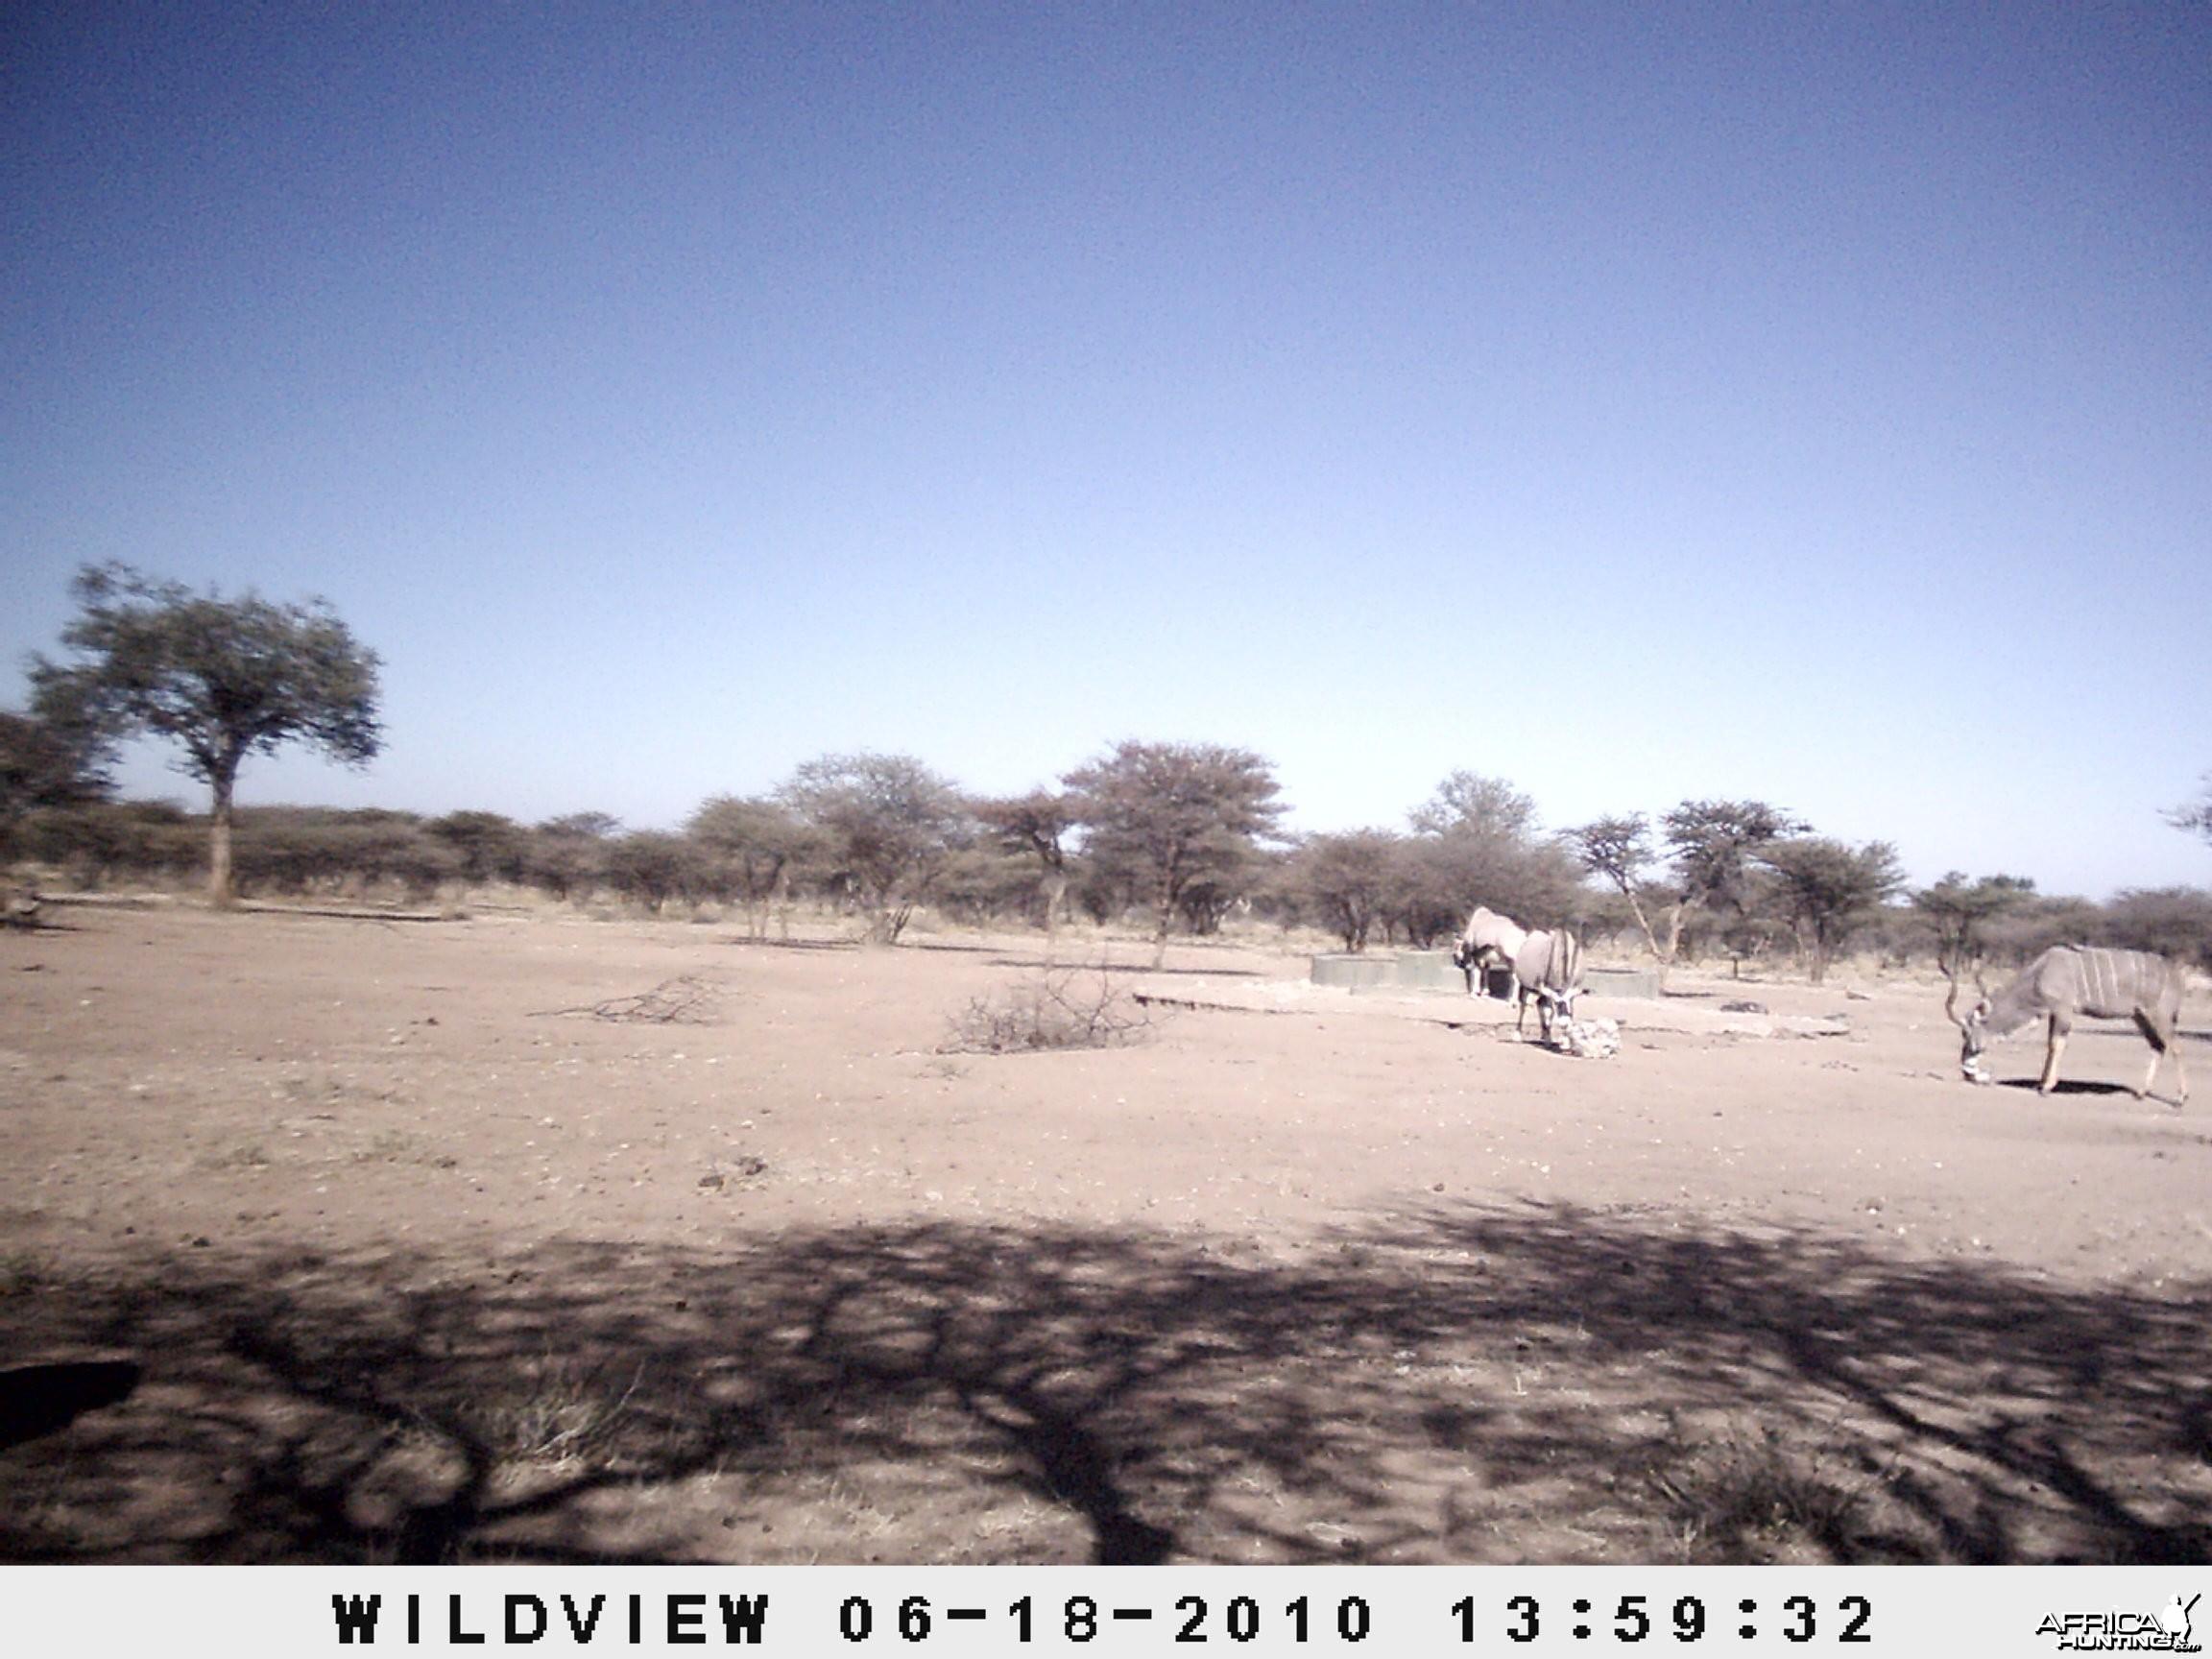 Kudu and Gemsbok, Namibia